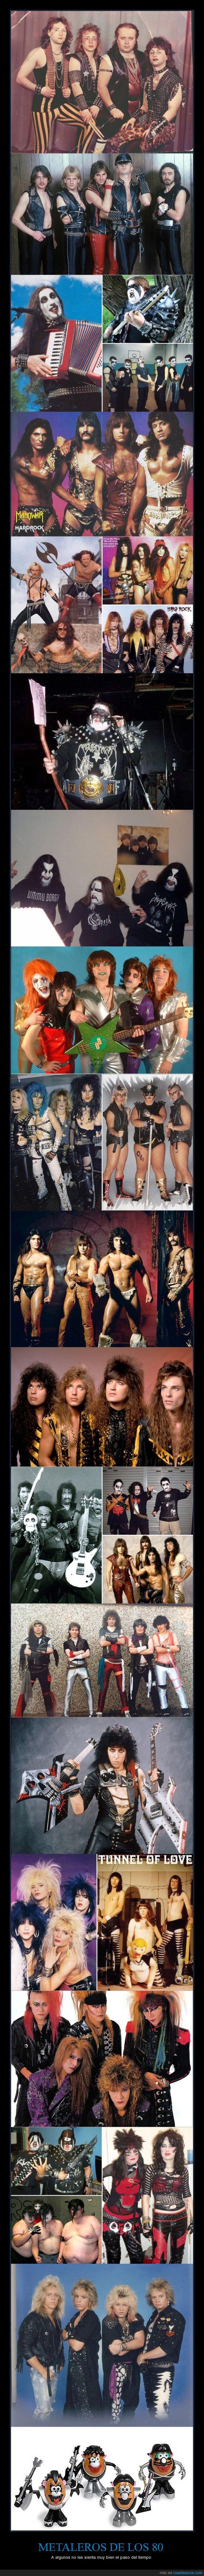 metal,metaleros,música,pintas,rock